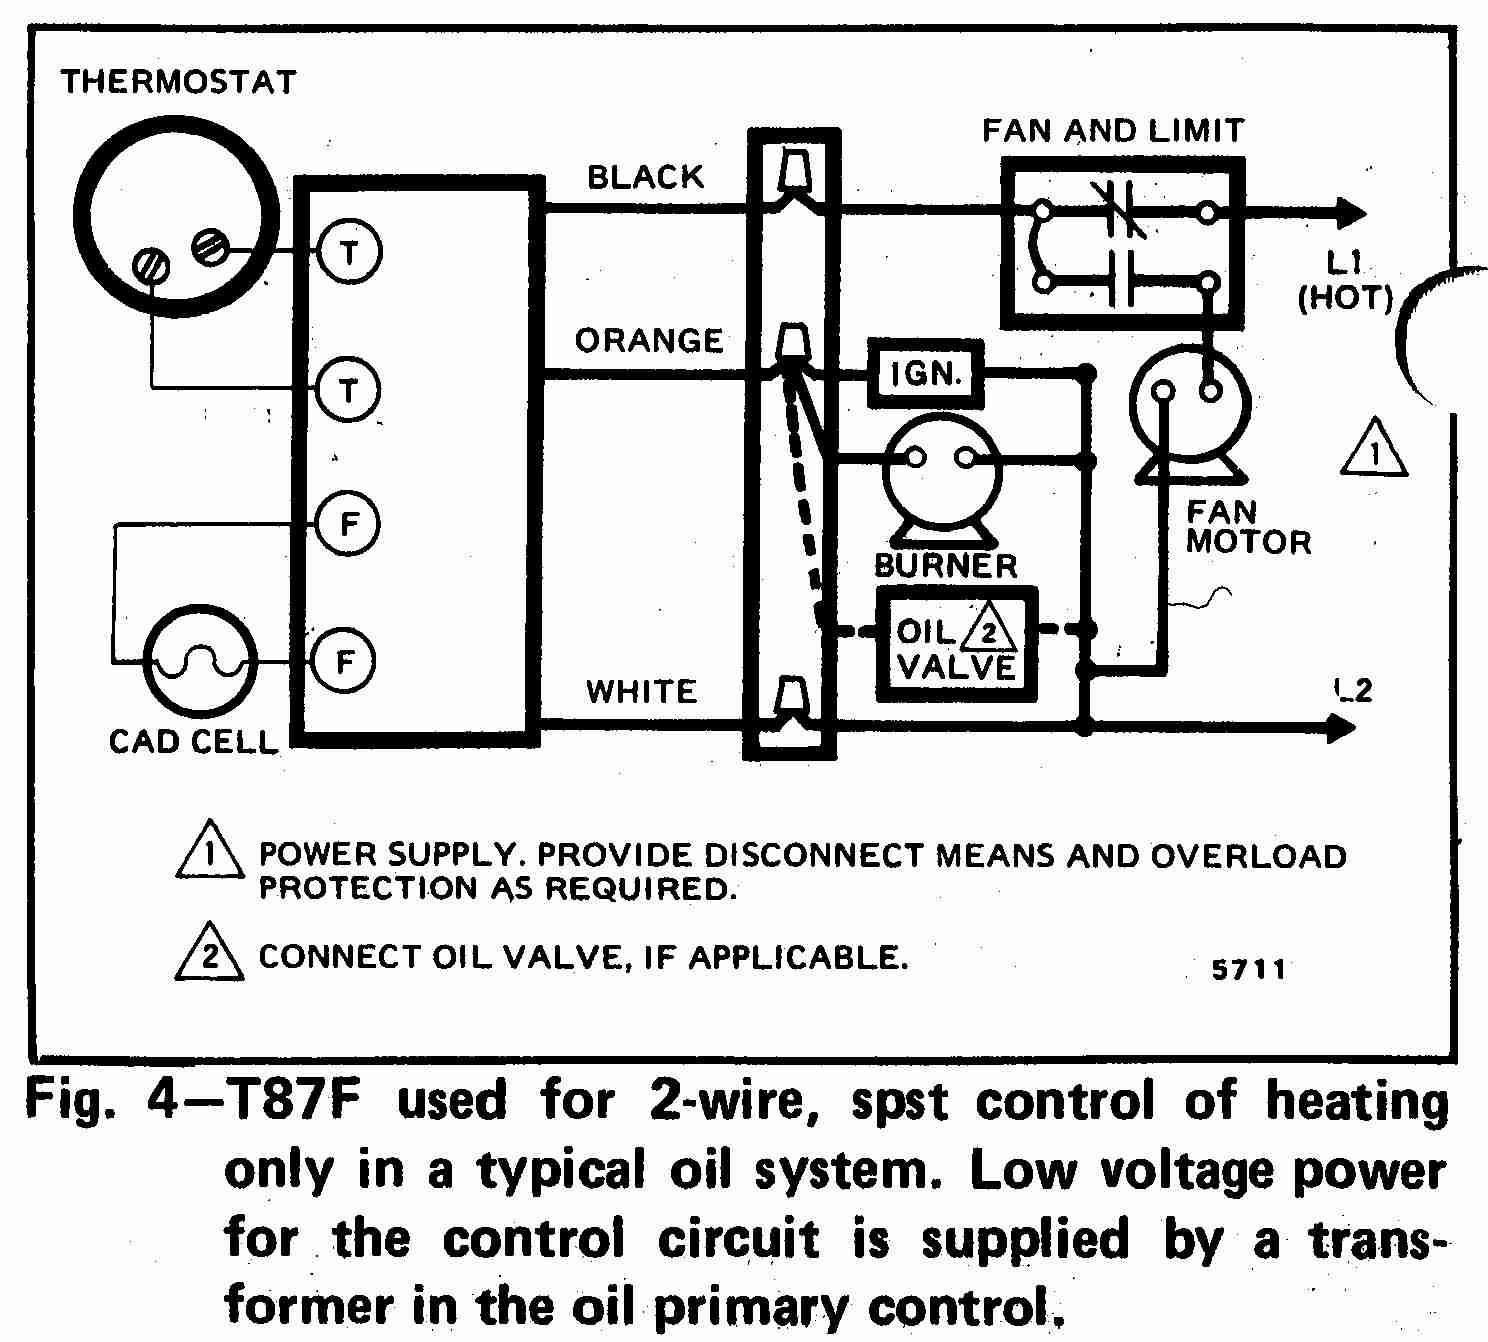 Diagram] Micro Thermostat Wiring Diagram Full Version Hd | Wiring Diagram For Thermostat